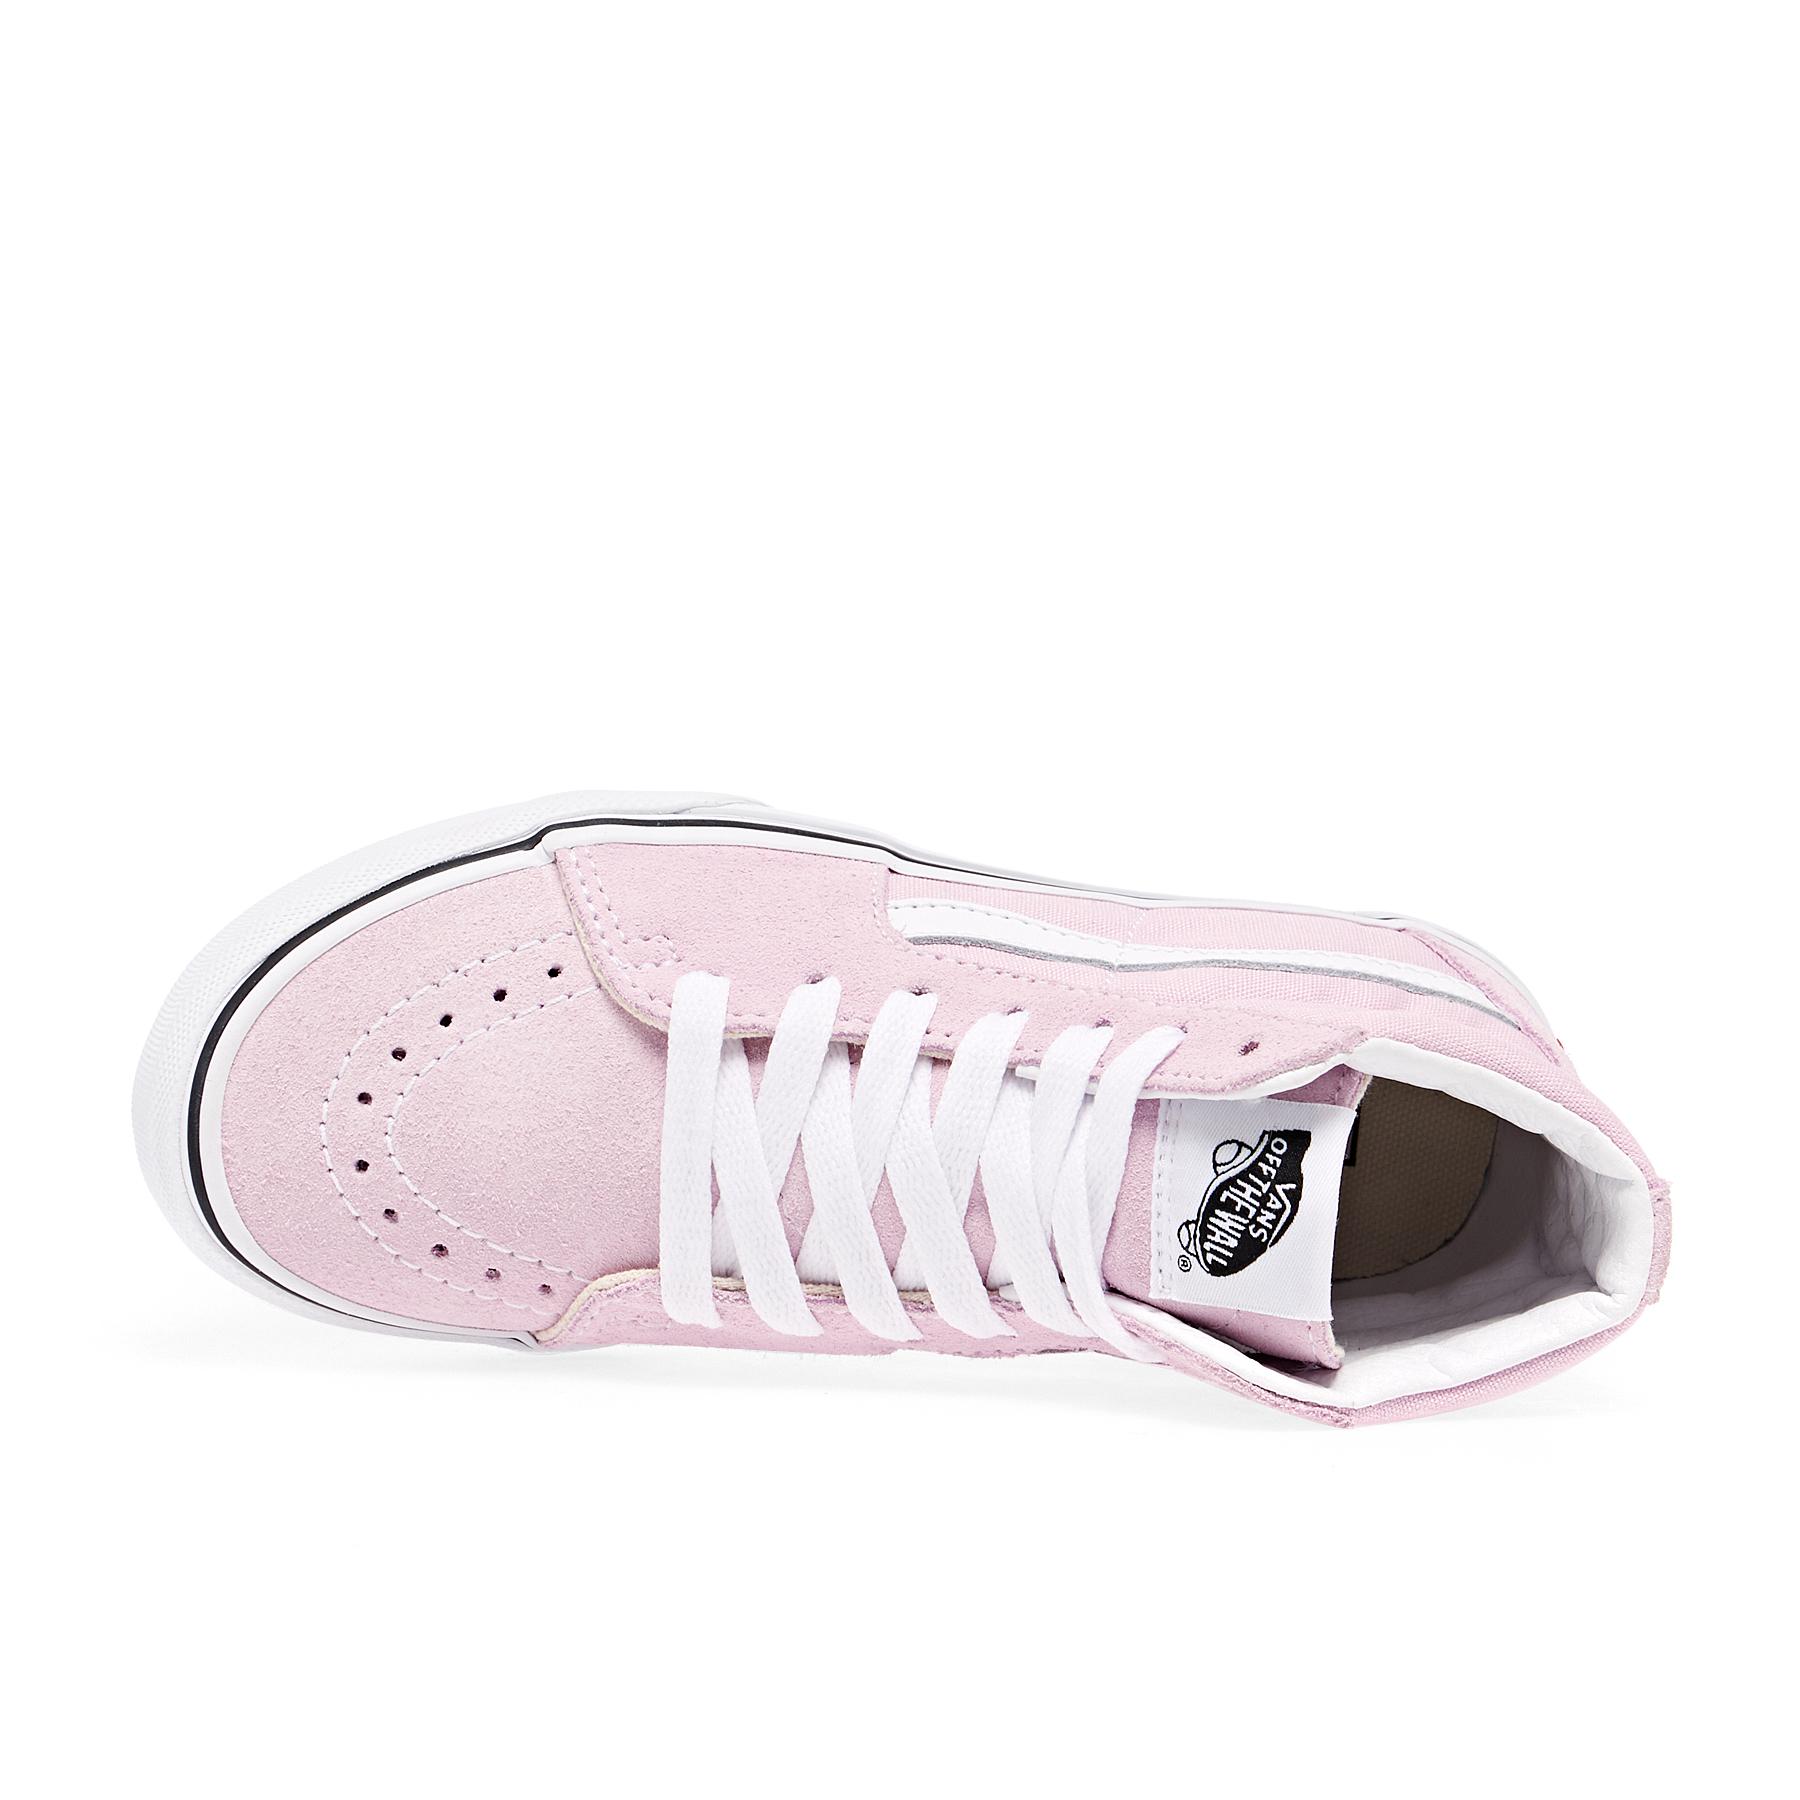 Vans Sk8 Hi Youth Kids Shoes - Free